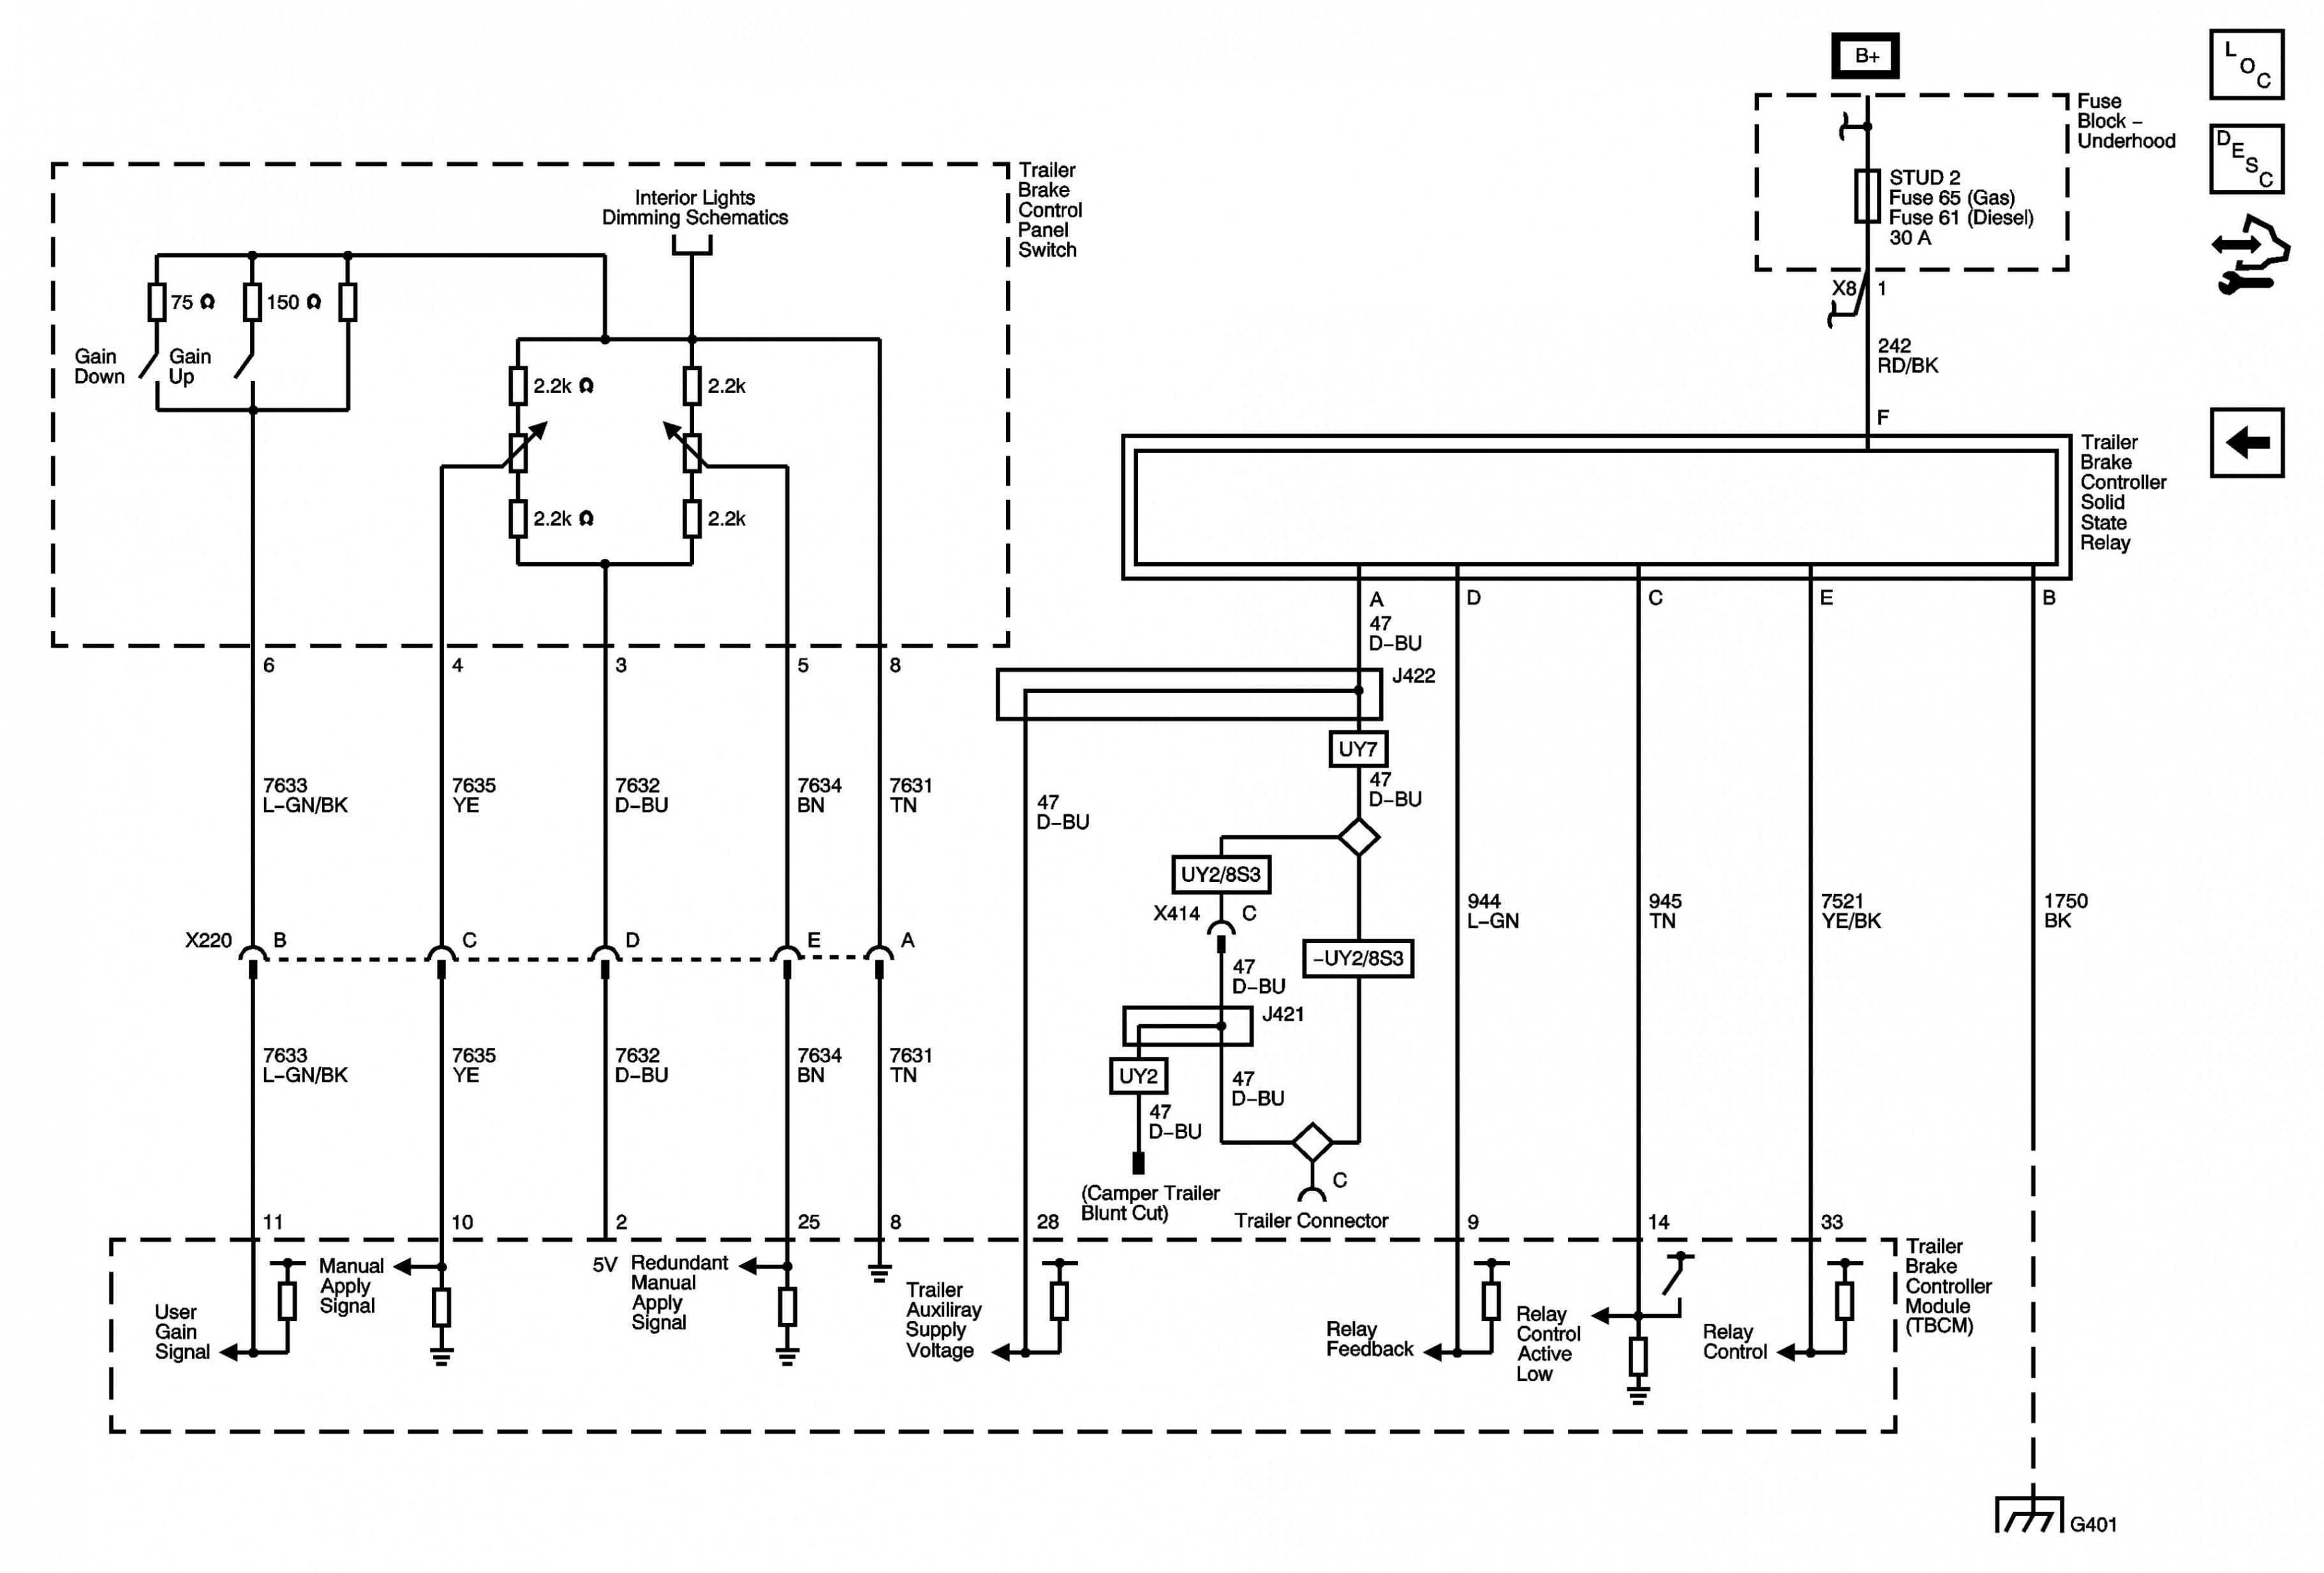 30 Amp Twist Lock Plug Wiring Diagram – 4 Prong Twist Lock Plug - Nema L14-30 Wiring Diagram